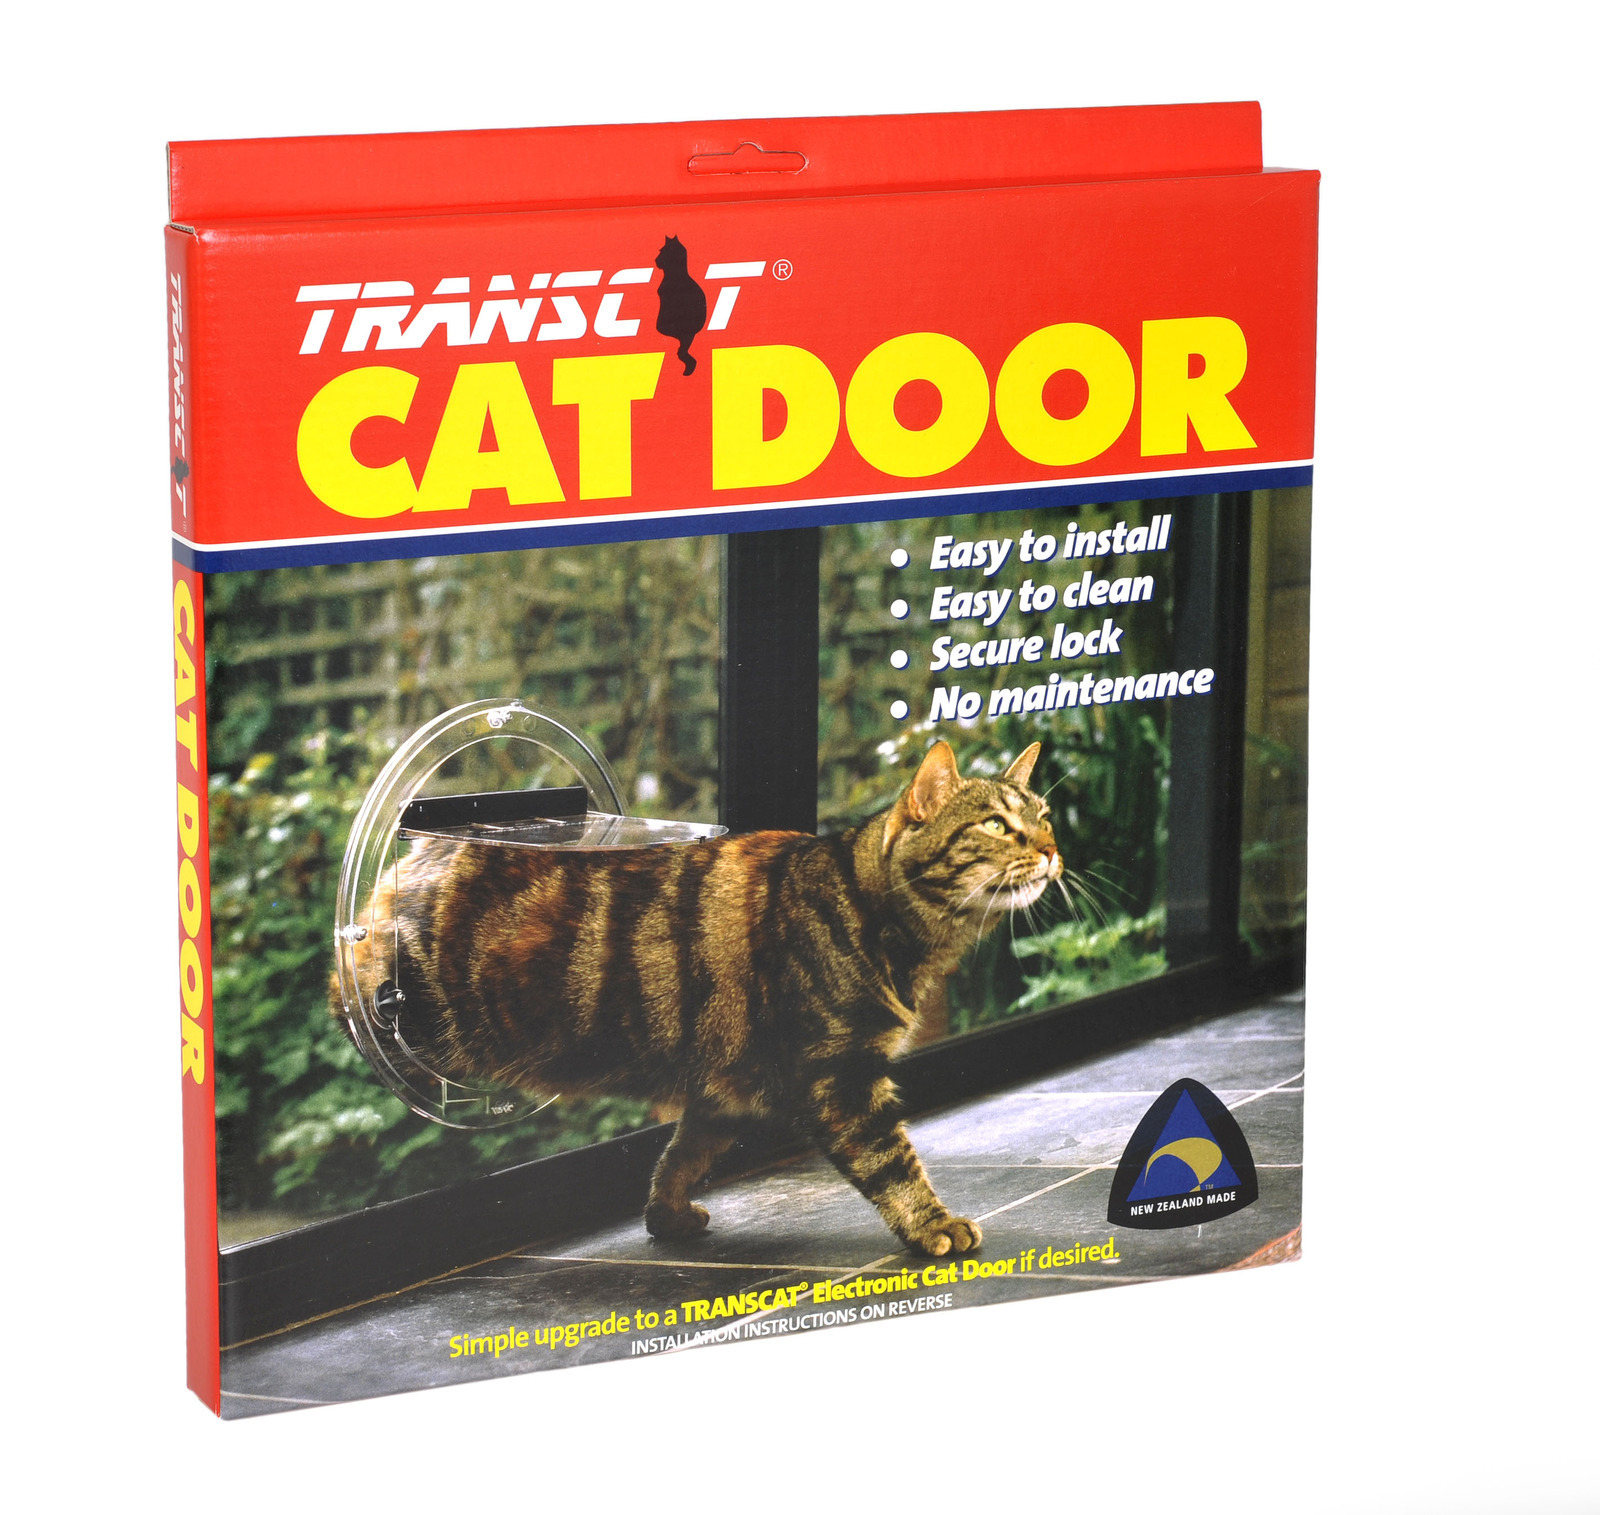 Transcat brand cat door box on white background